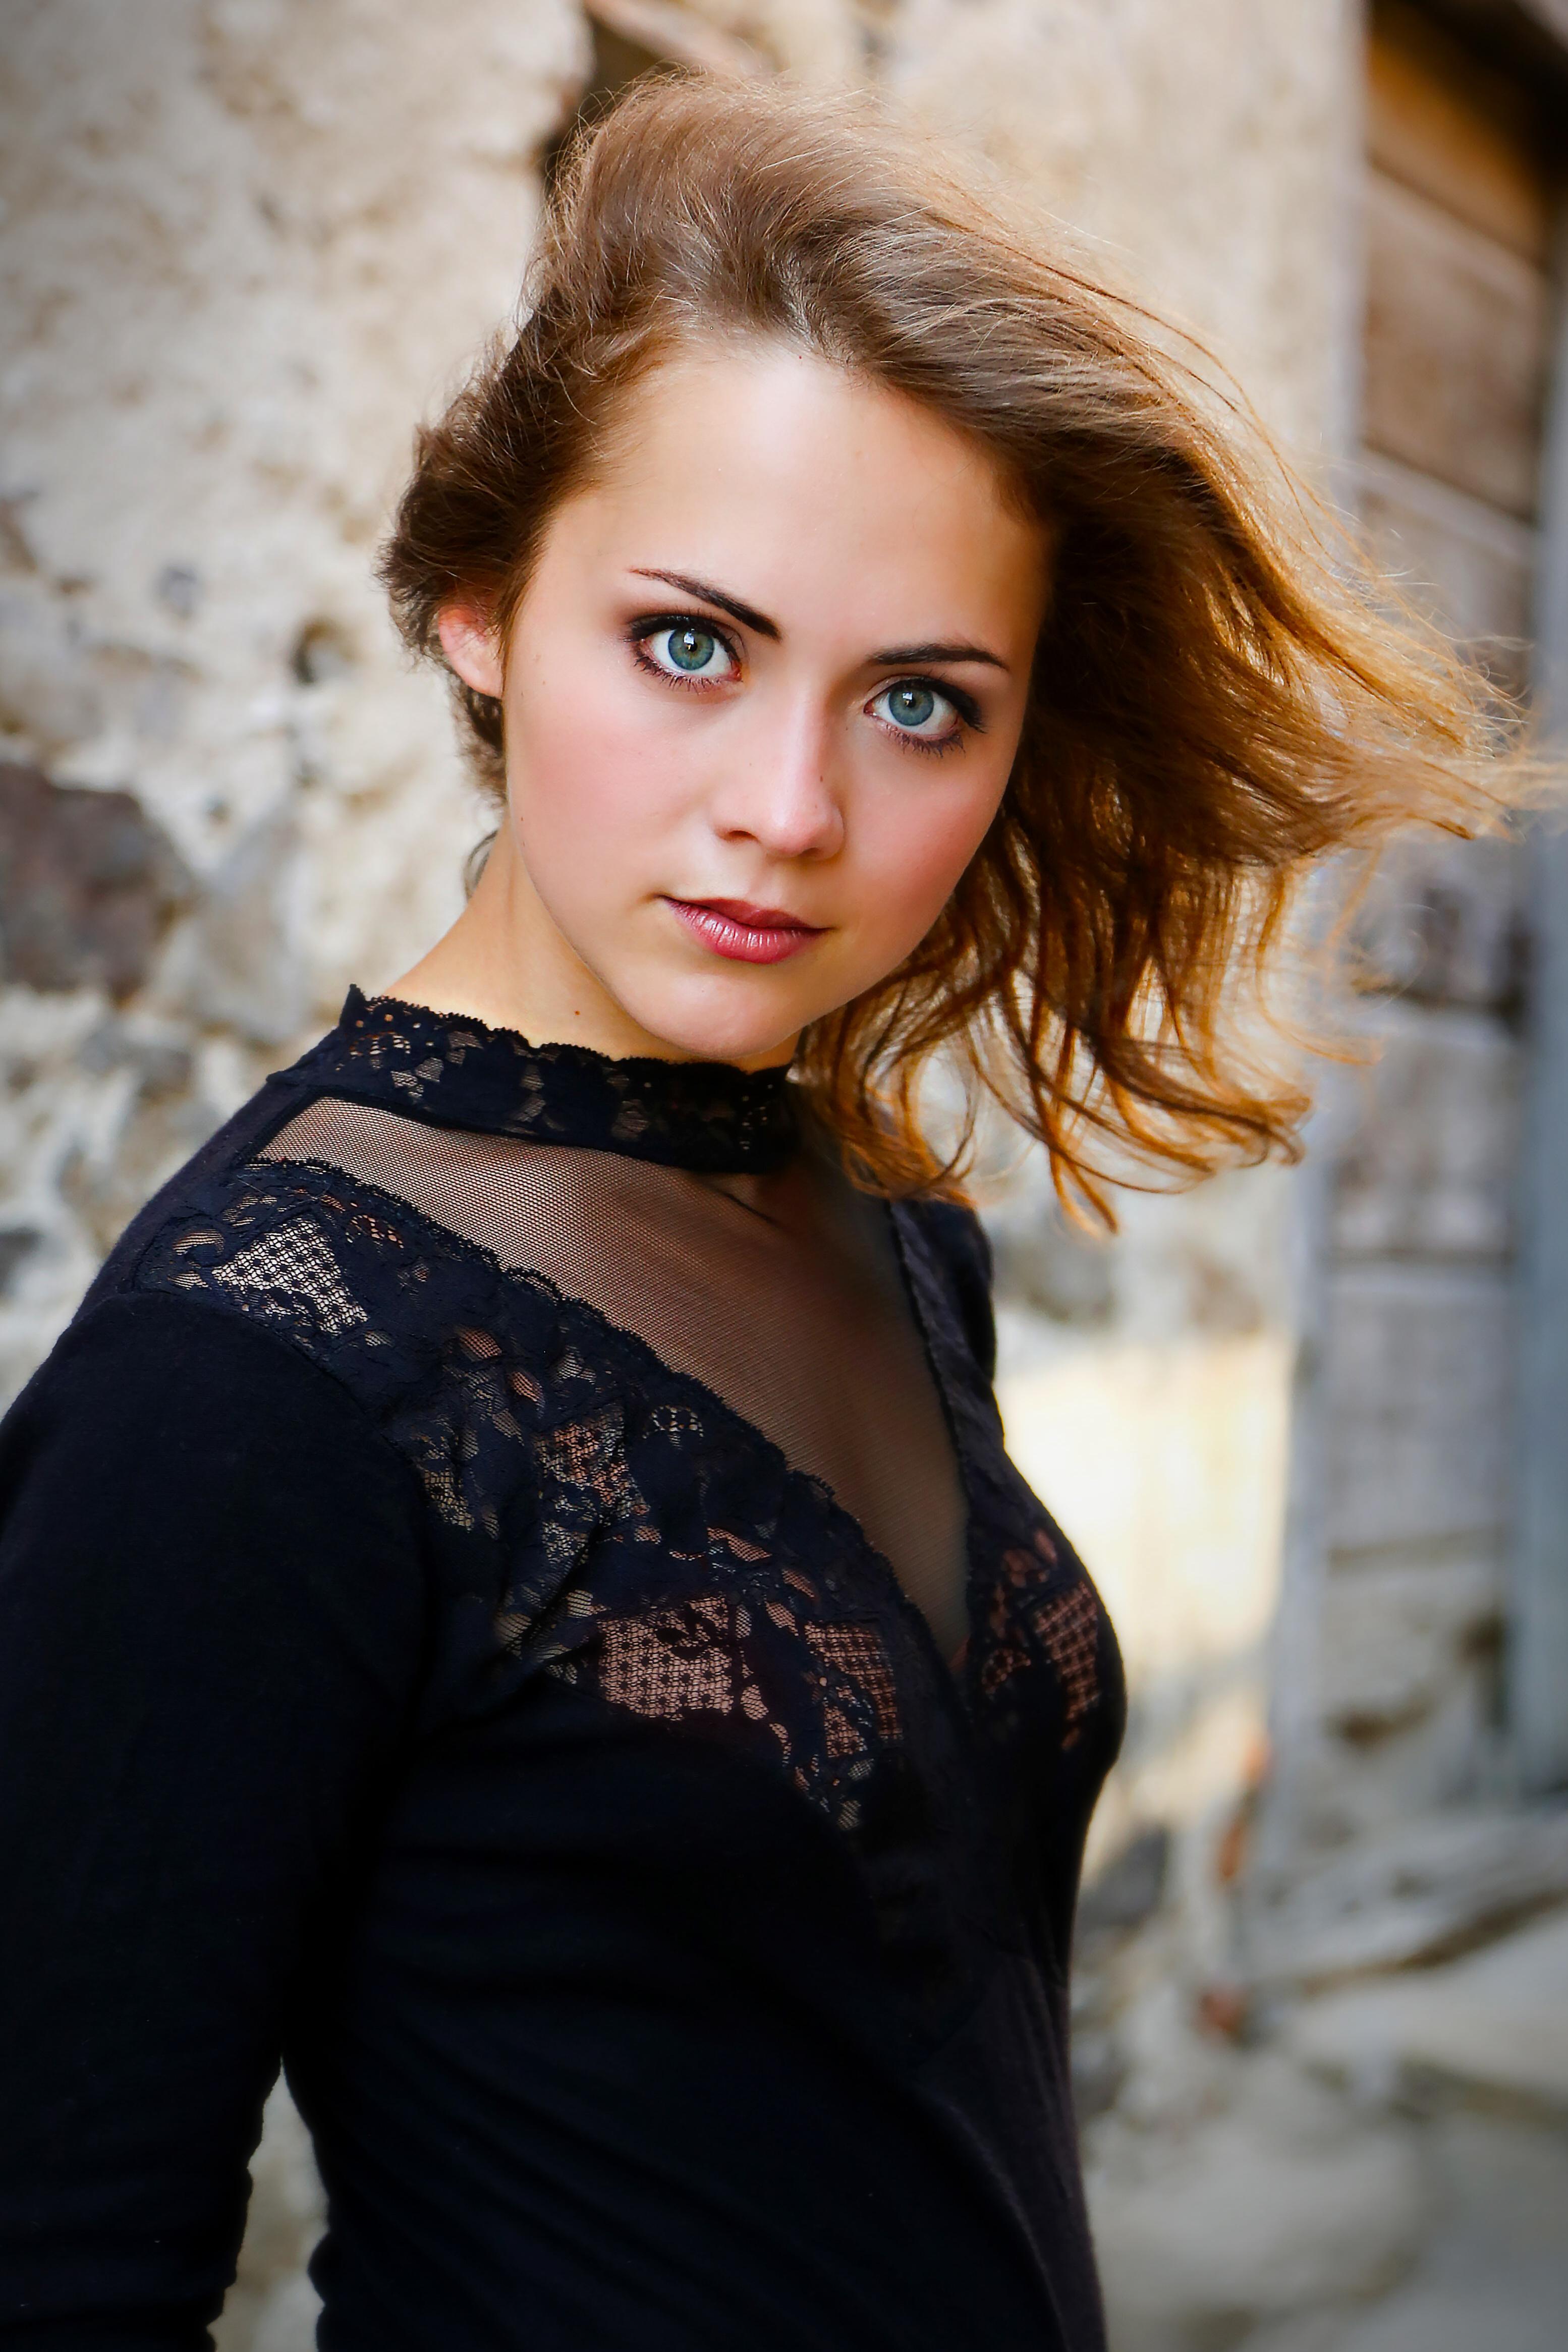 File:Portrait Glenna Weber.jpg